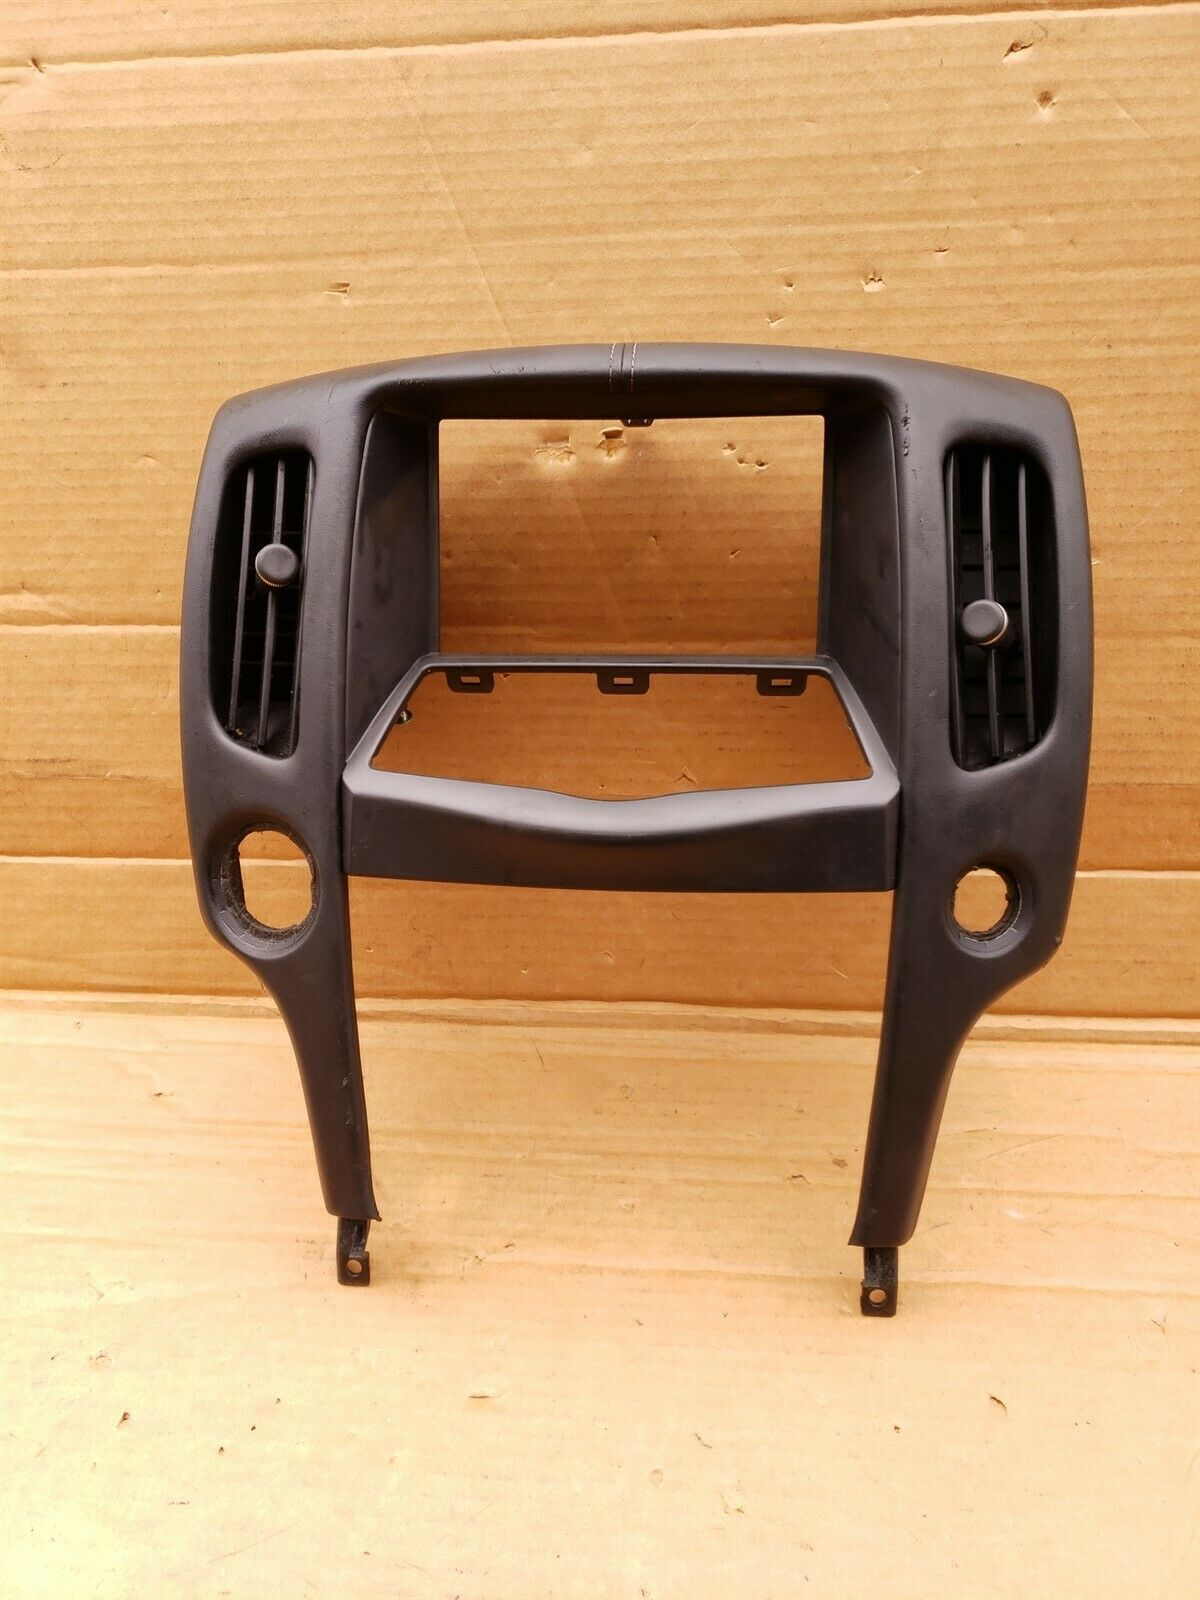 09-20 Nissan 370Z Z34 Radio Dash Bezel Trim For Navigation Display